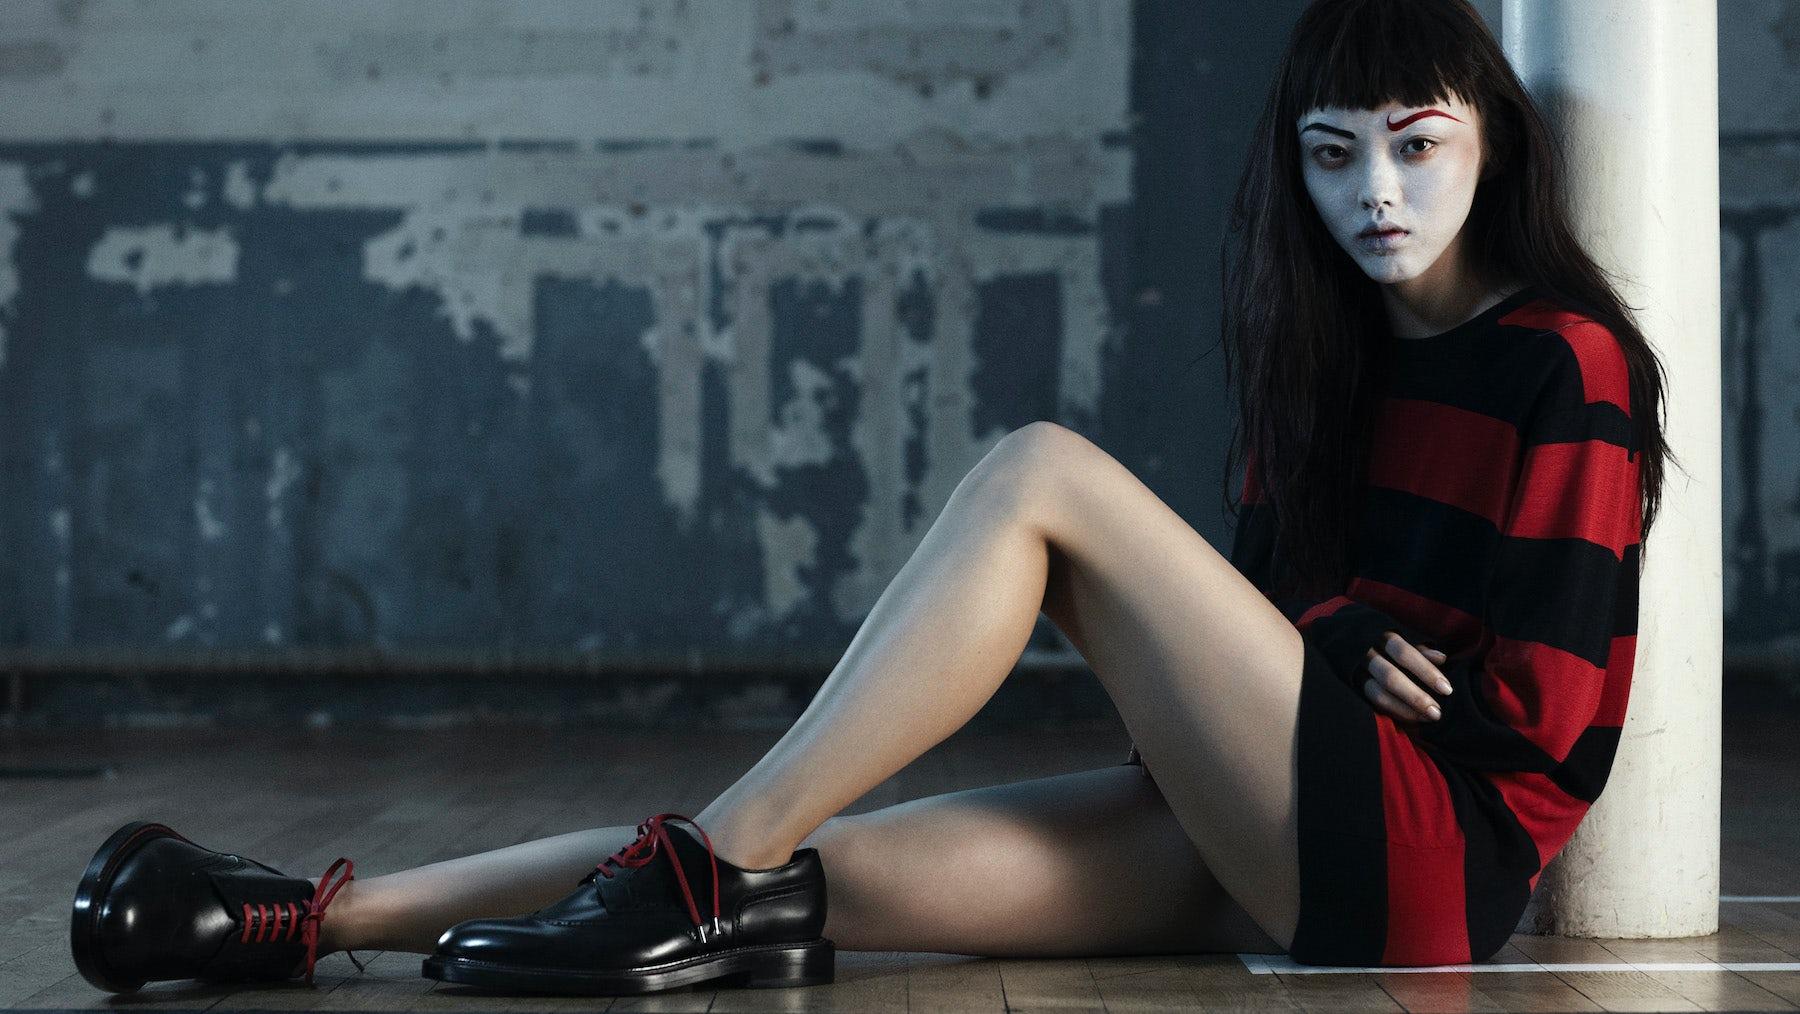 Styling by Kanako B. Koga, photography by Rene Habermacher featuring Rila Fukushima   Source: Vogue Uomo